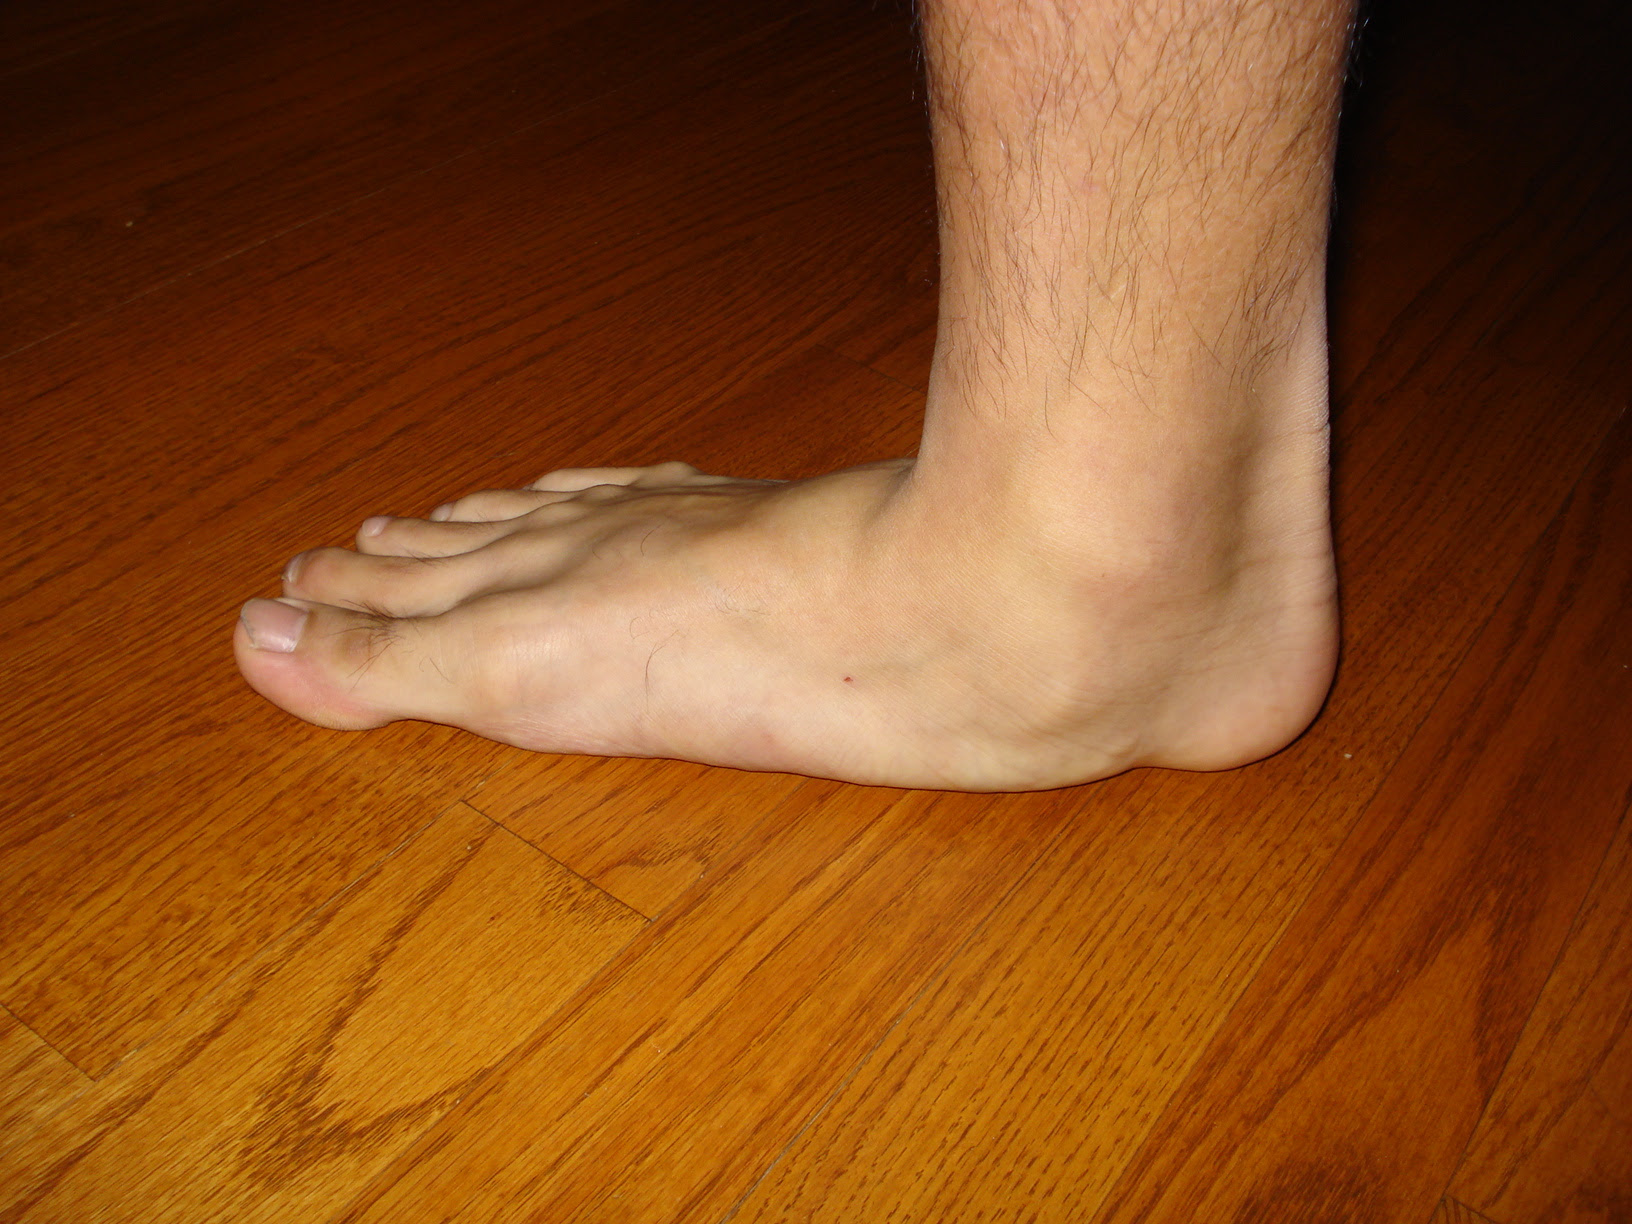 flatfoot2.jpg